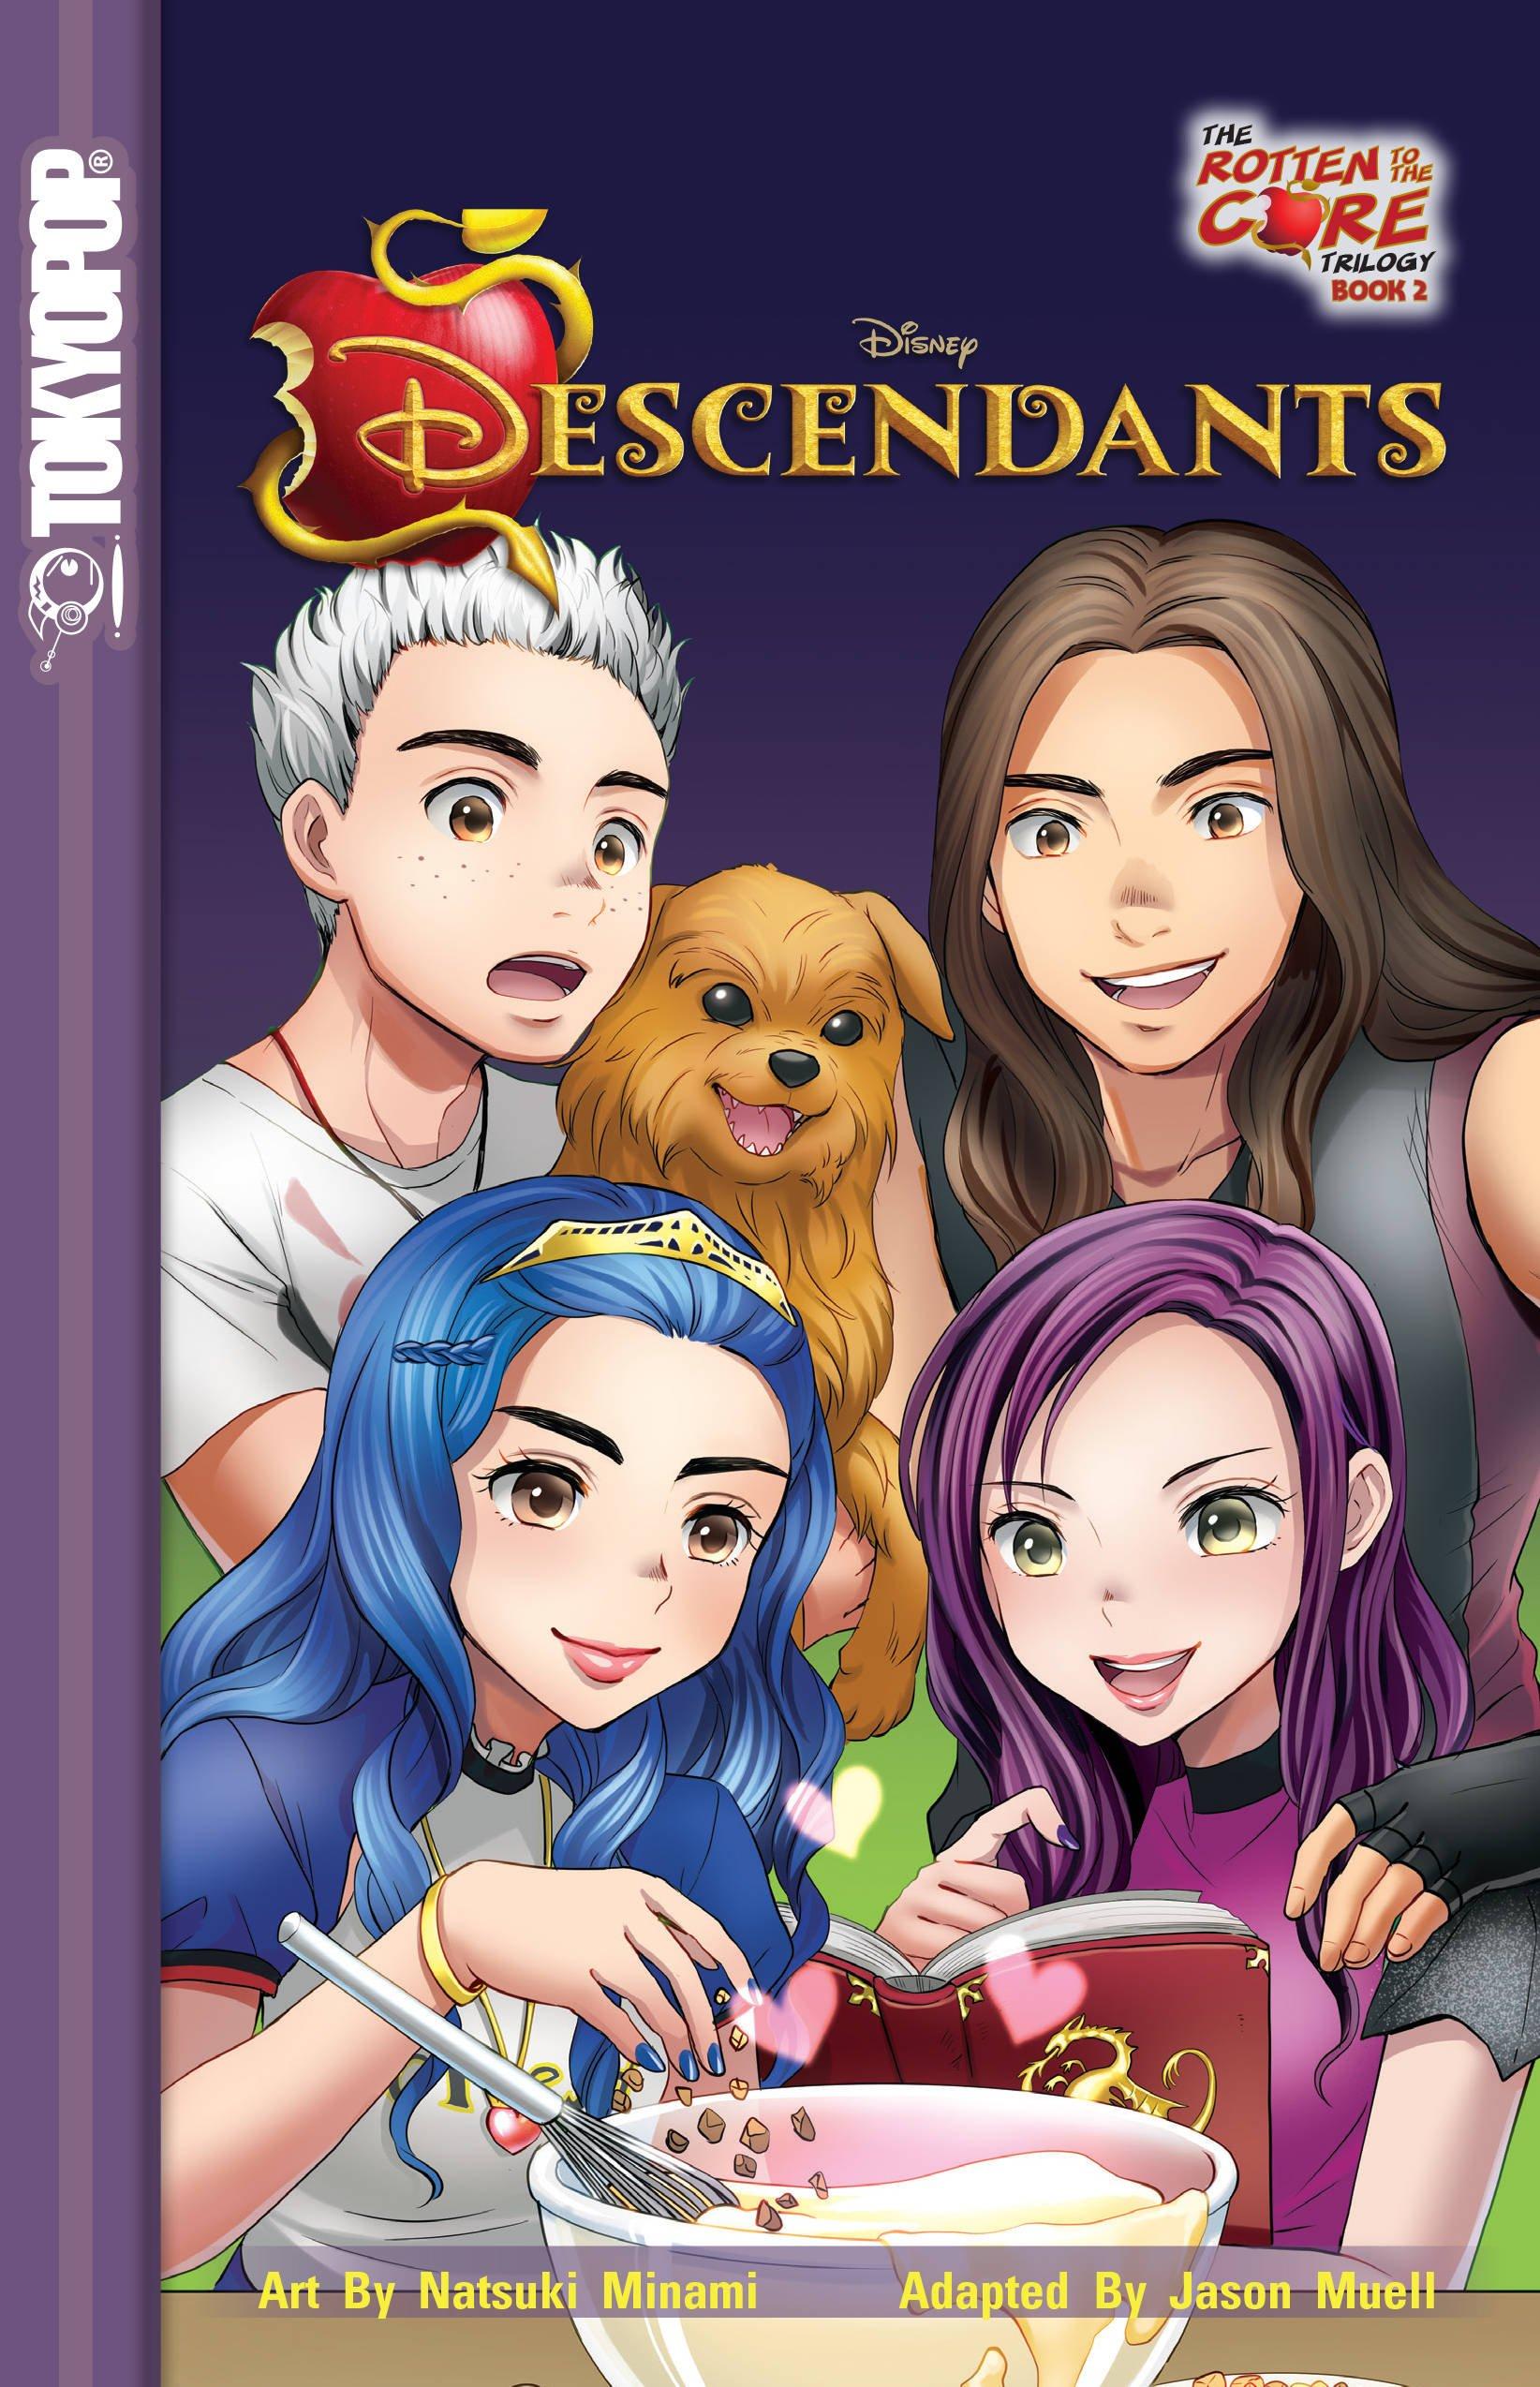 Descendants the Rotten to the Core Trilogy 2